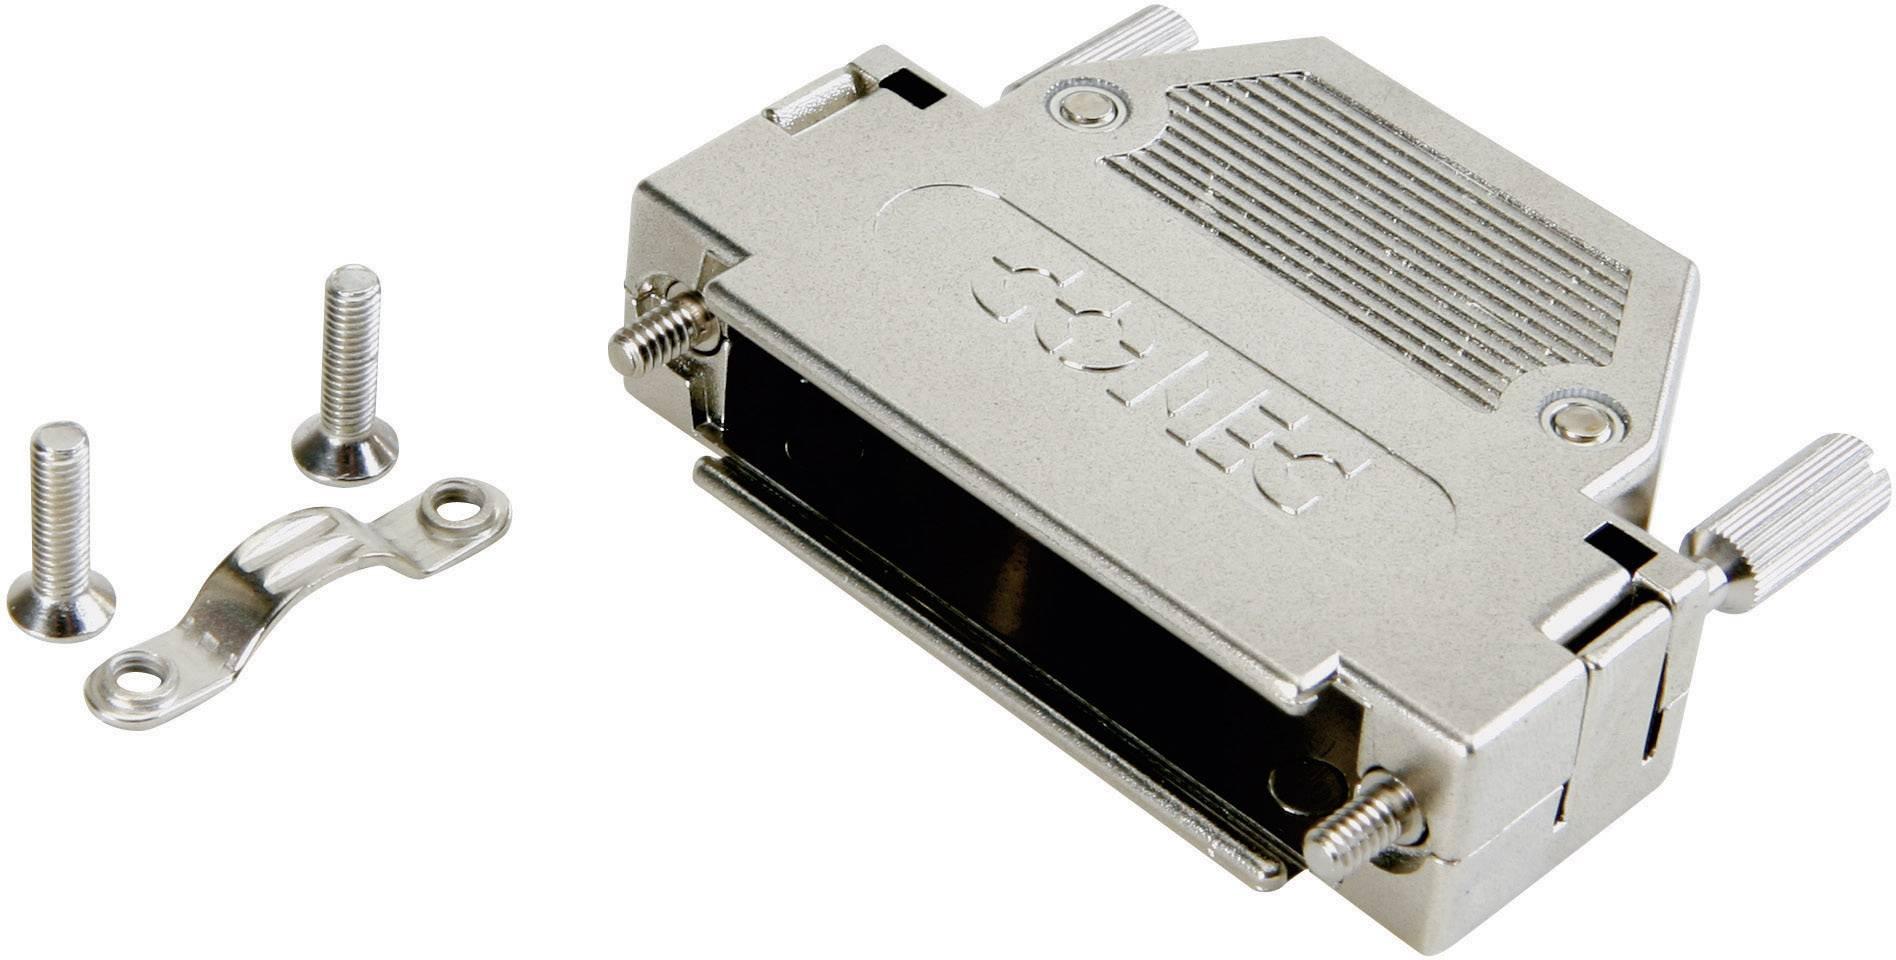 D-SUB púzdro Conec 165X10179XE 165X10179XE, Počet pinov: 50, plast, 180 °, čierna, 1 ks